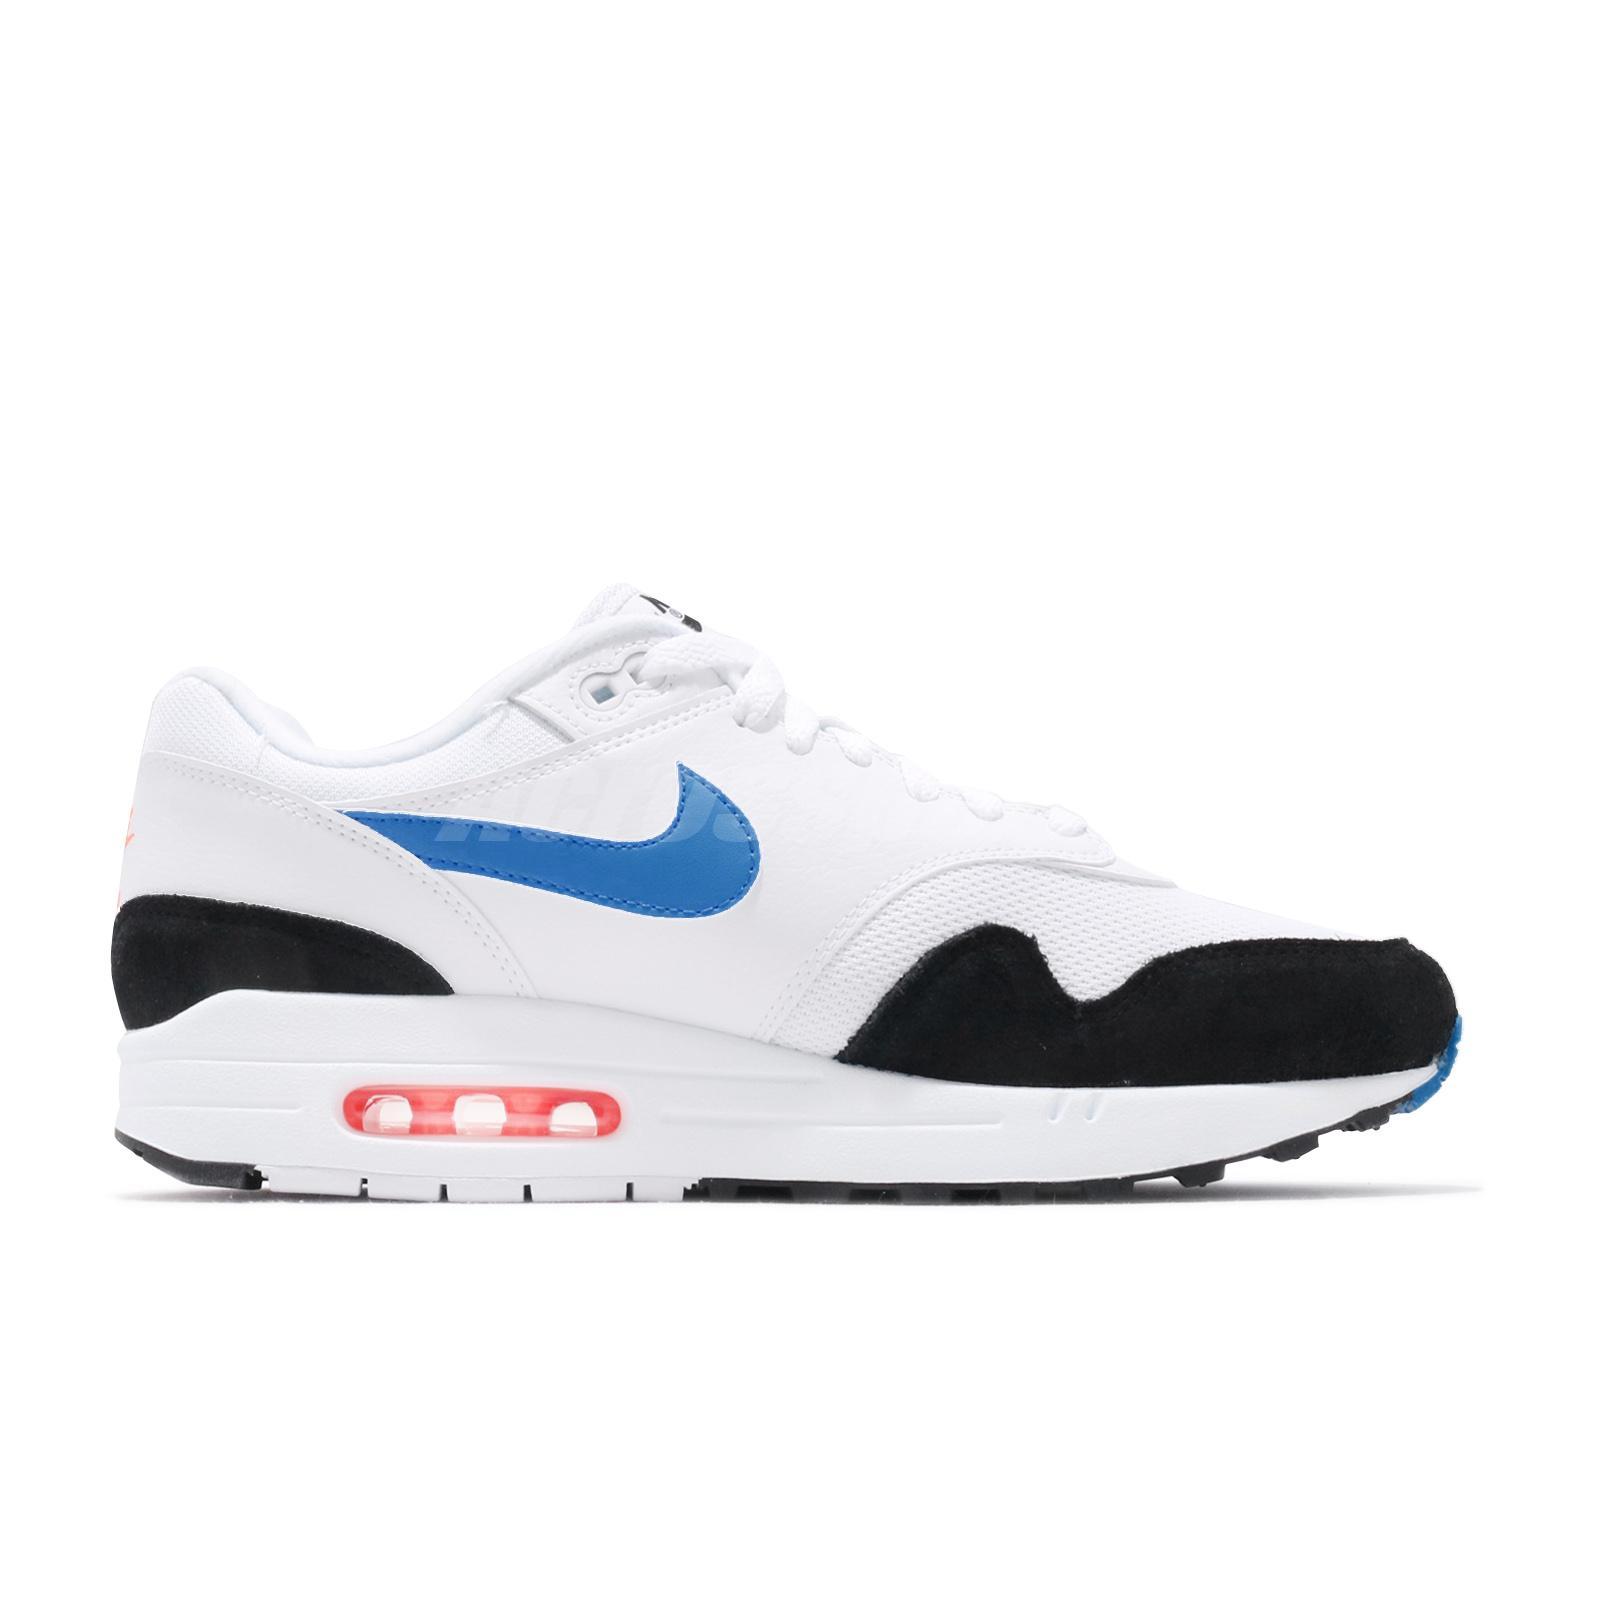 Nike Air Max 1 White Blue Orange Mens Lifestyle Running Shoes NSW AH8145 112